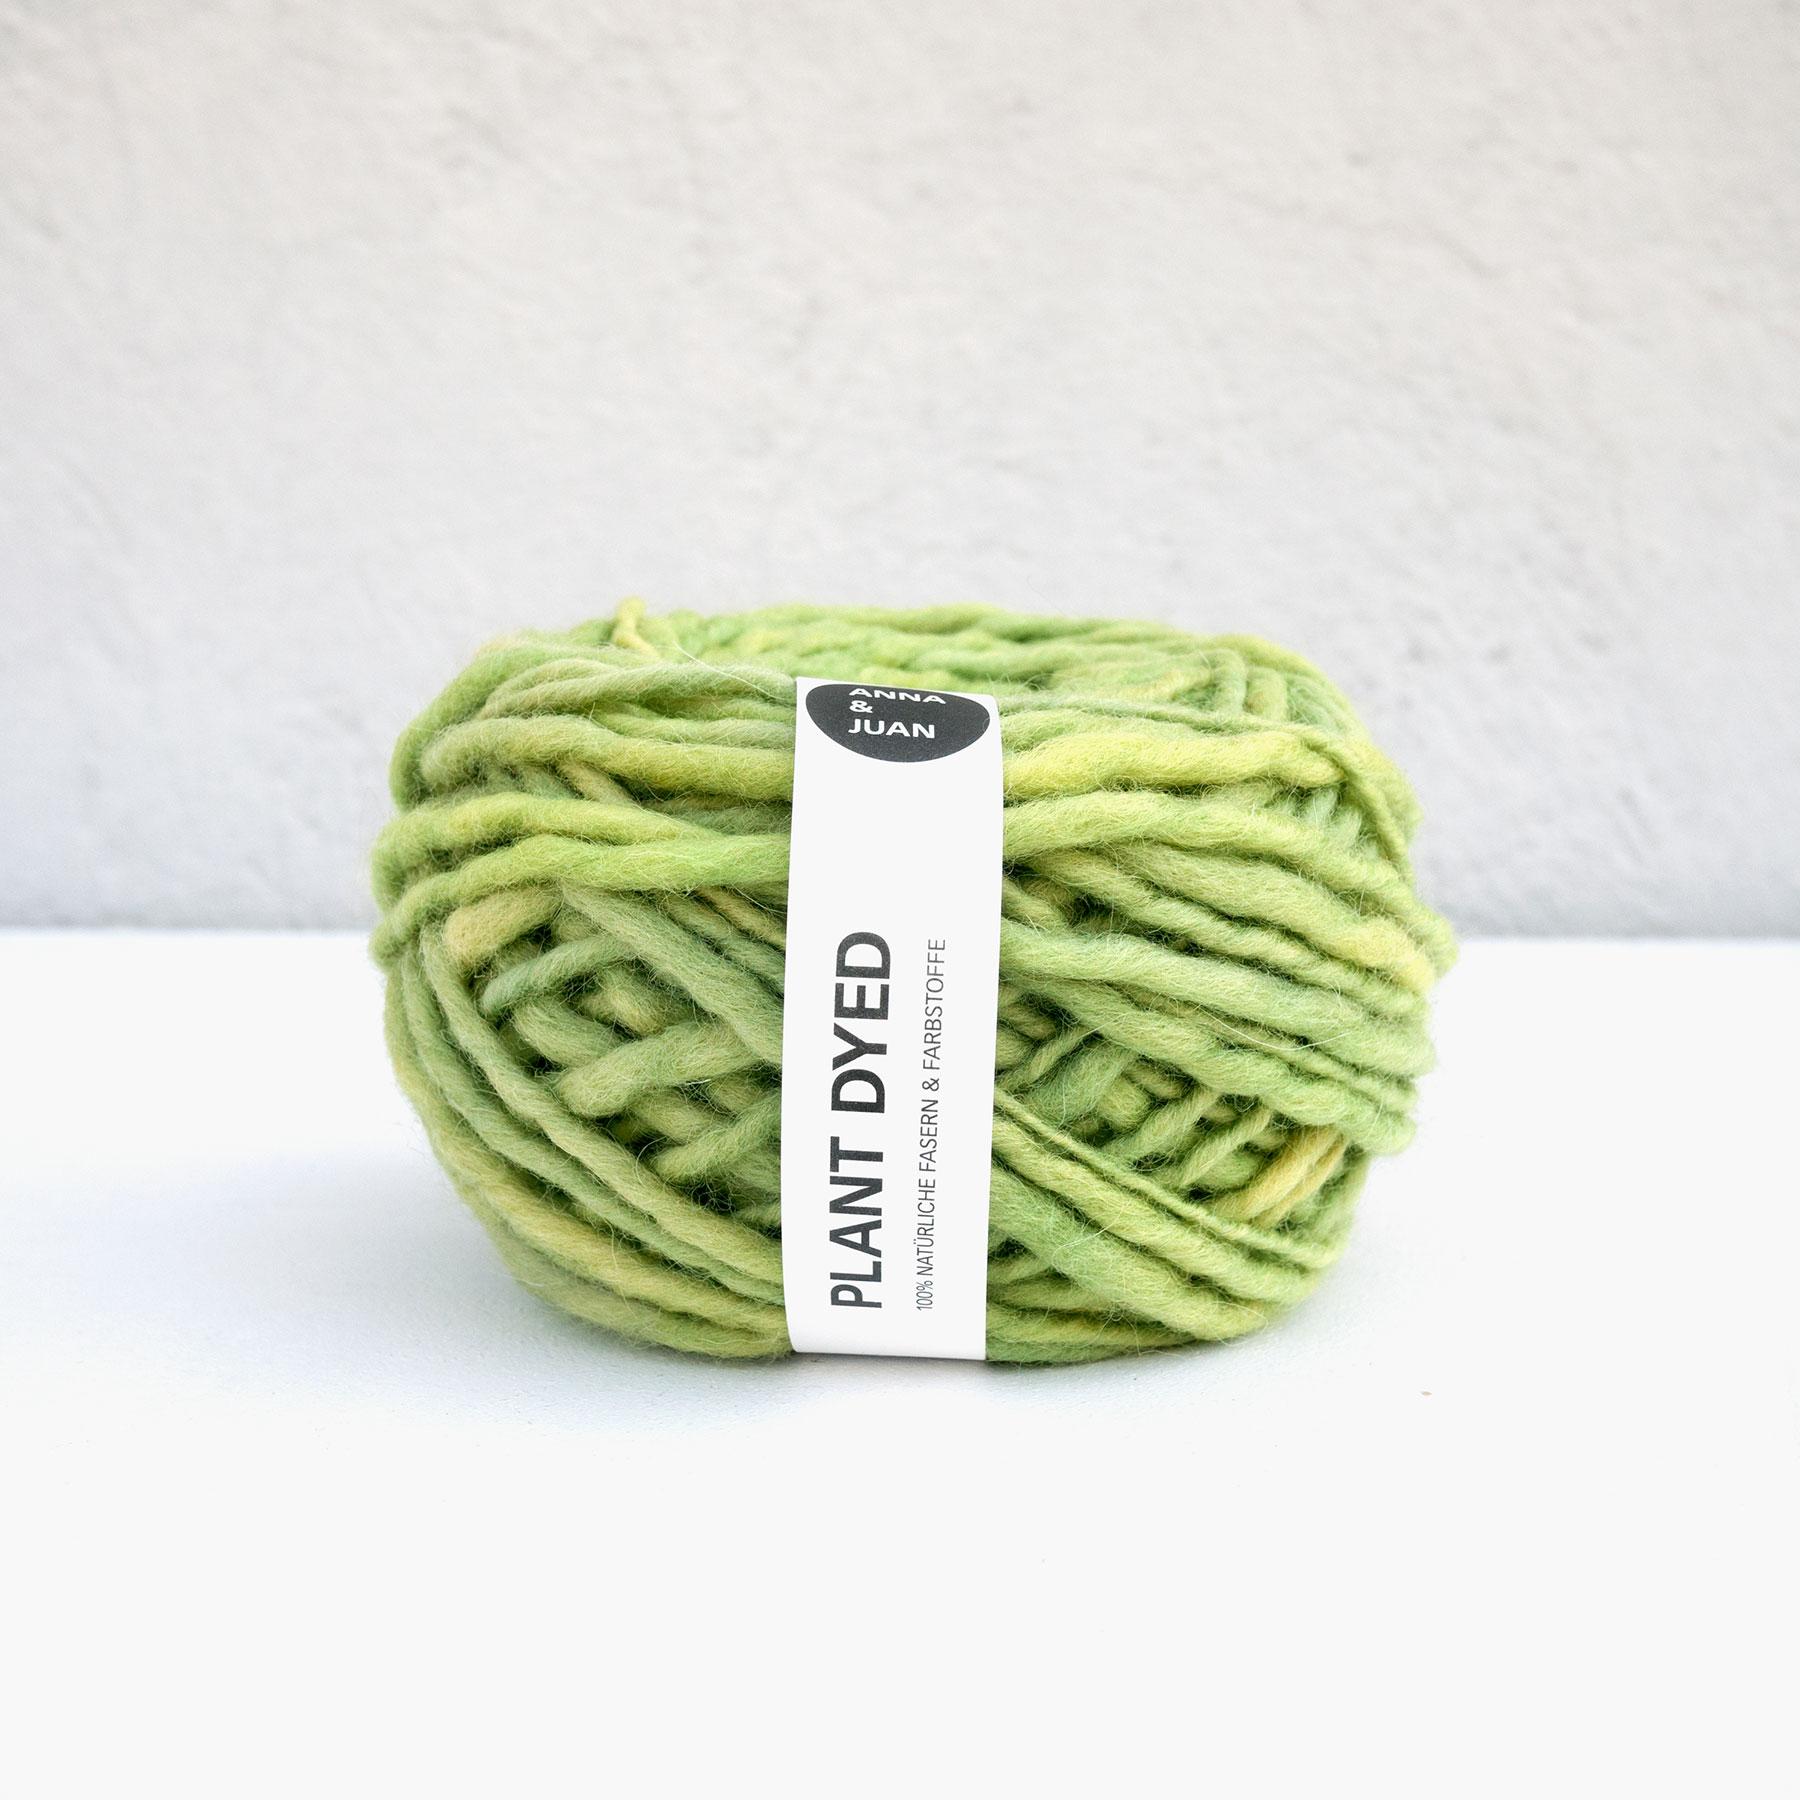 Anna & Juan Wolle «Plant Dyed» – Merino Handgesponnen – Super Bulky – mittleres Grün